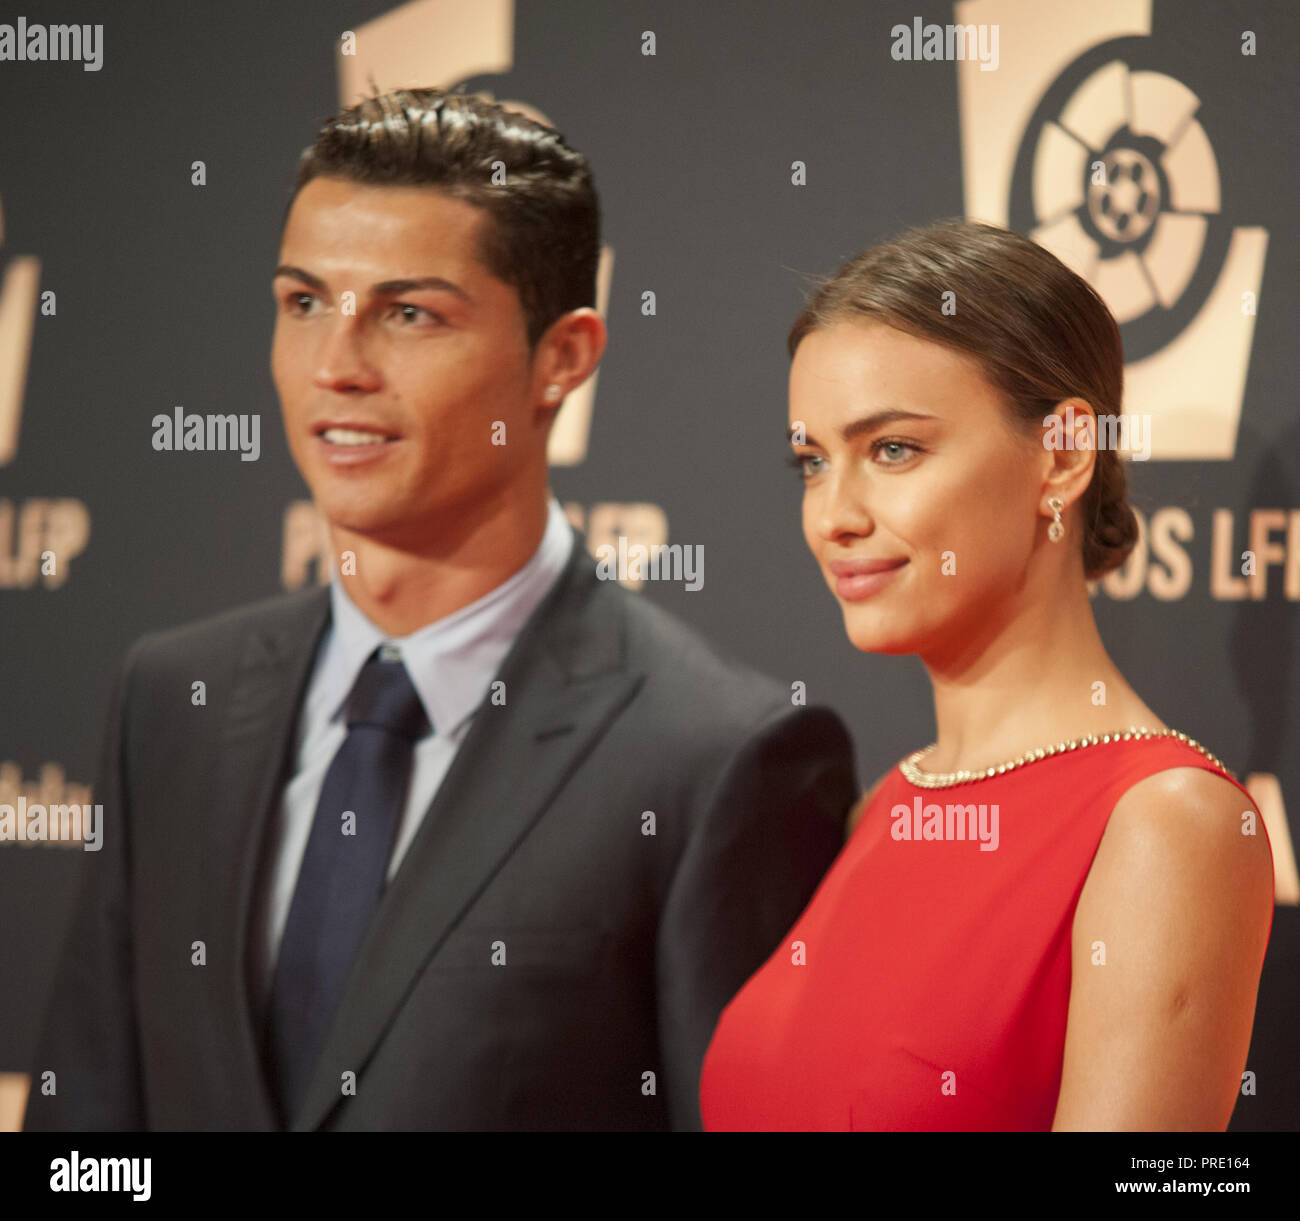 MADRID, SPAIN - OCTOBER 27: Cristiano Ronaldo and Irina Shayk attends the  LFP (Professional Football League) Awards Gala 2014 on October 27, 2014 in  Madrid, Spain. People: Cristiano Ronaldo and Irina Shayk Stock Photo - Alamy